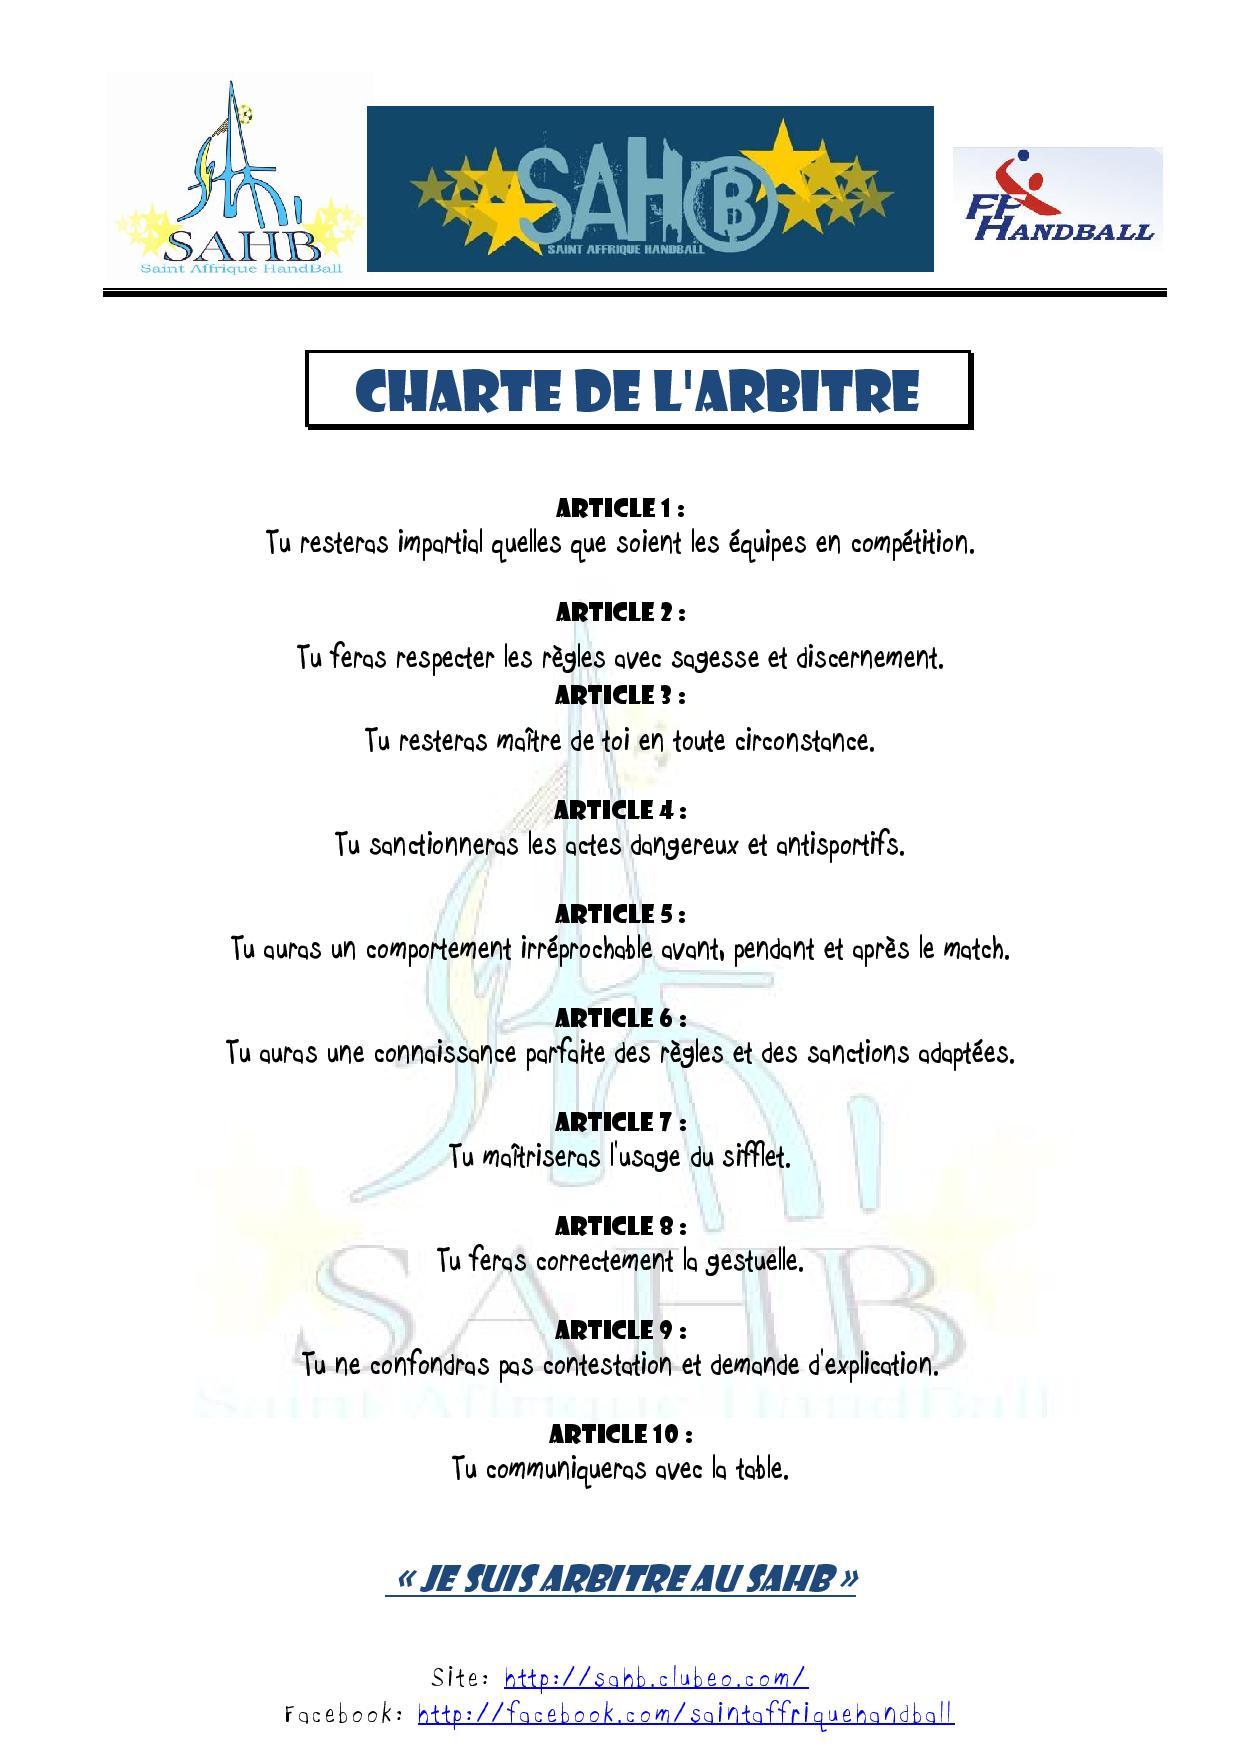 charte-arbitre (1)-page-001.jpg